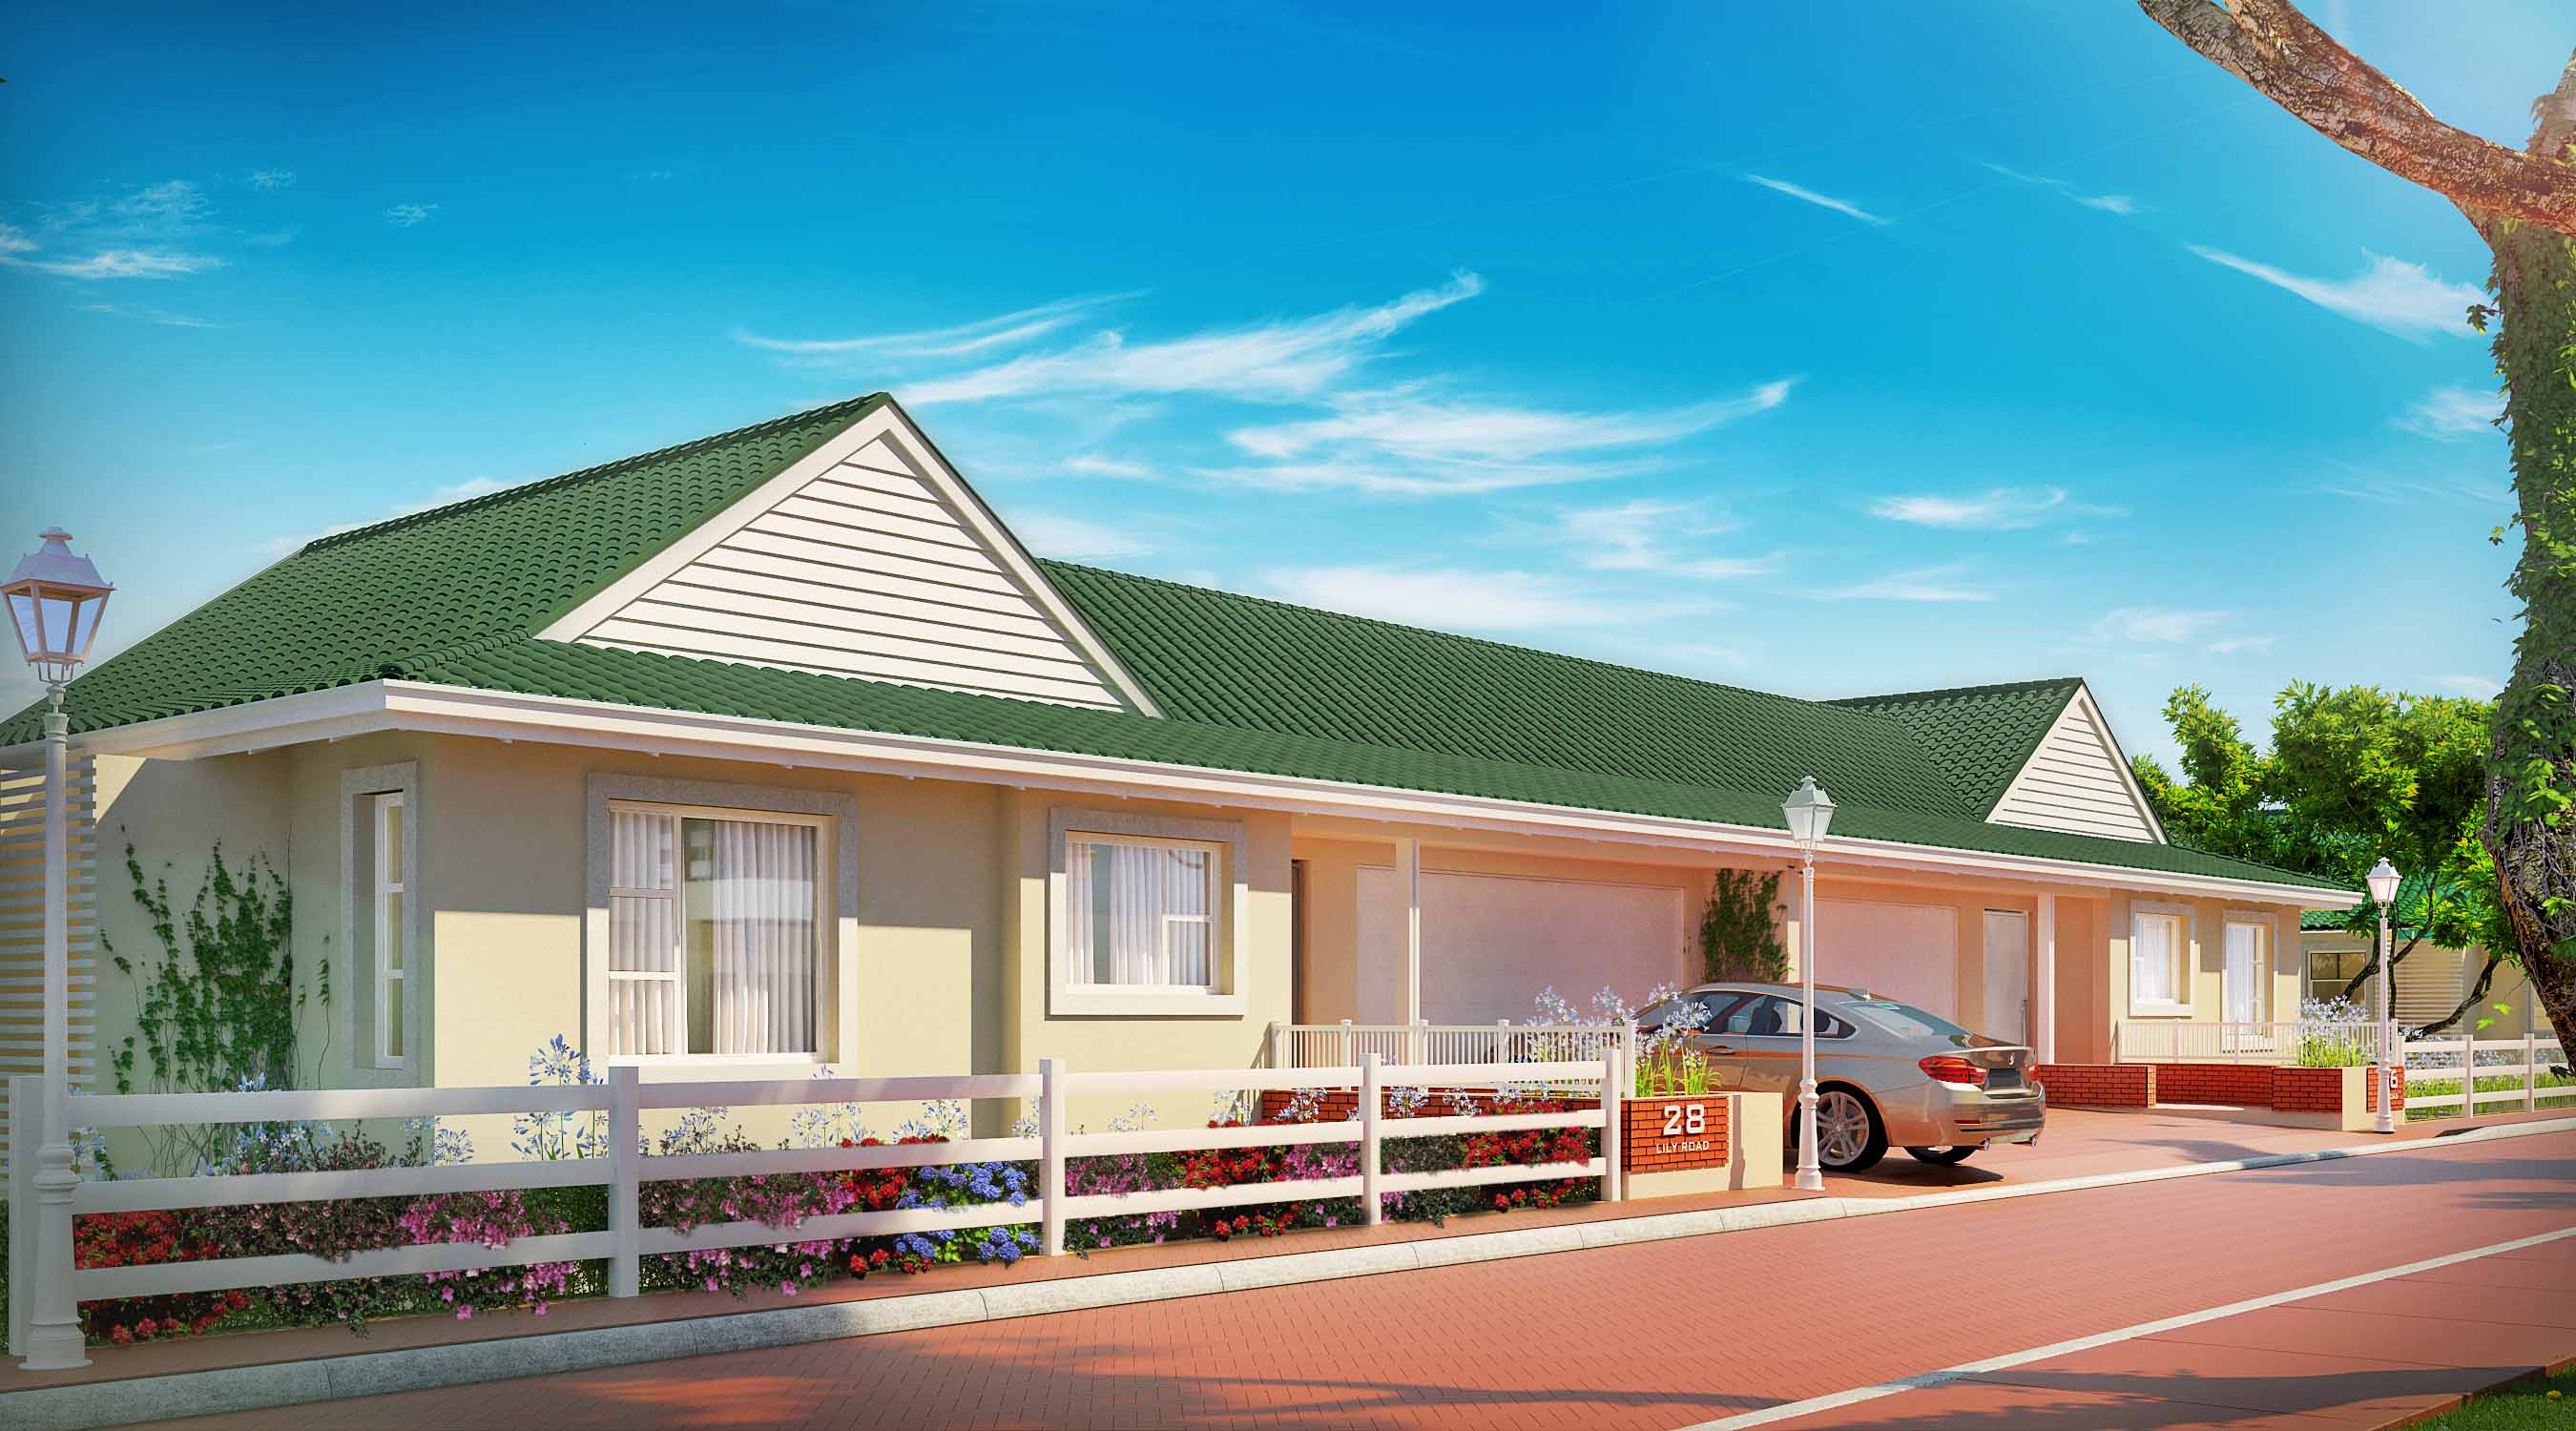 Mount Edgecombe Retirement Village named top KZN retirement opportunity